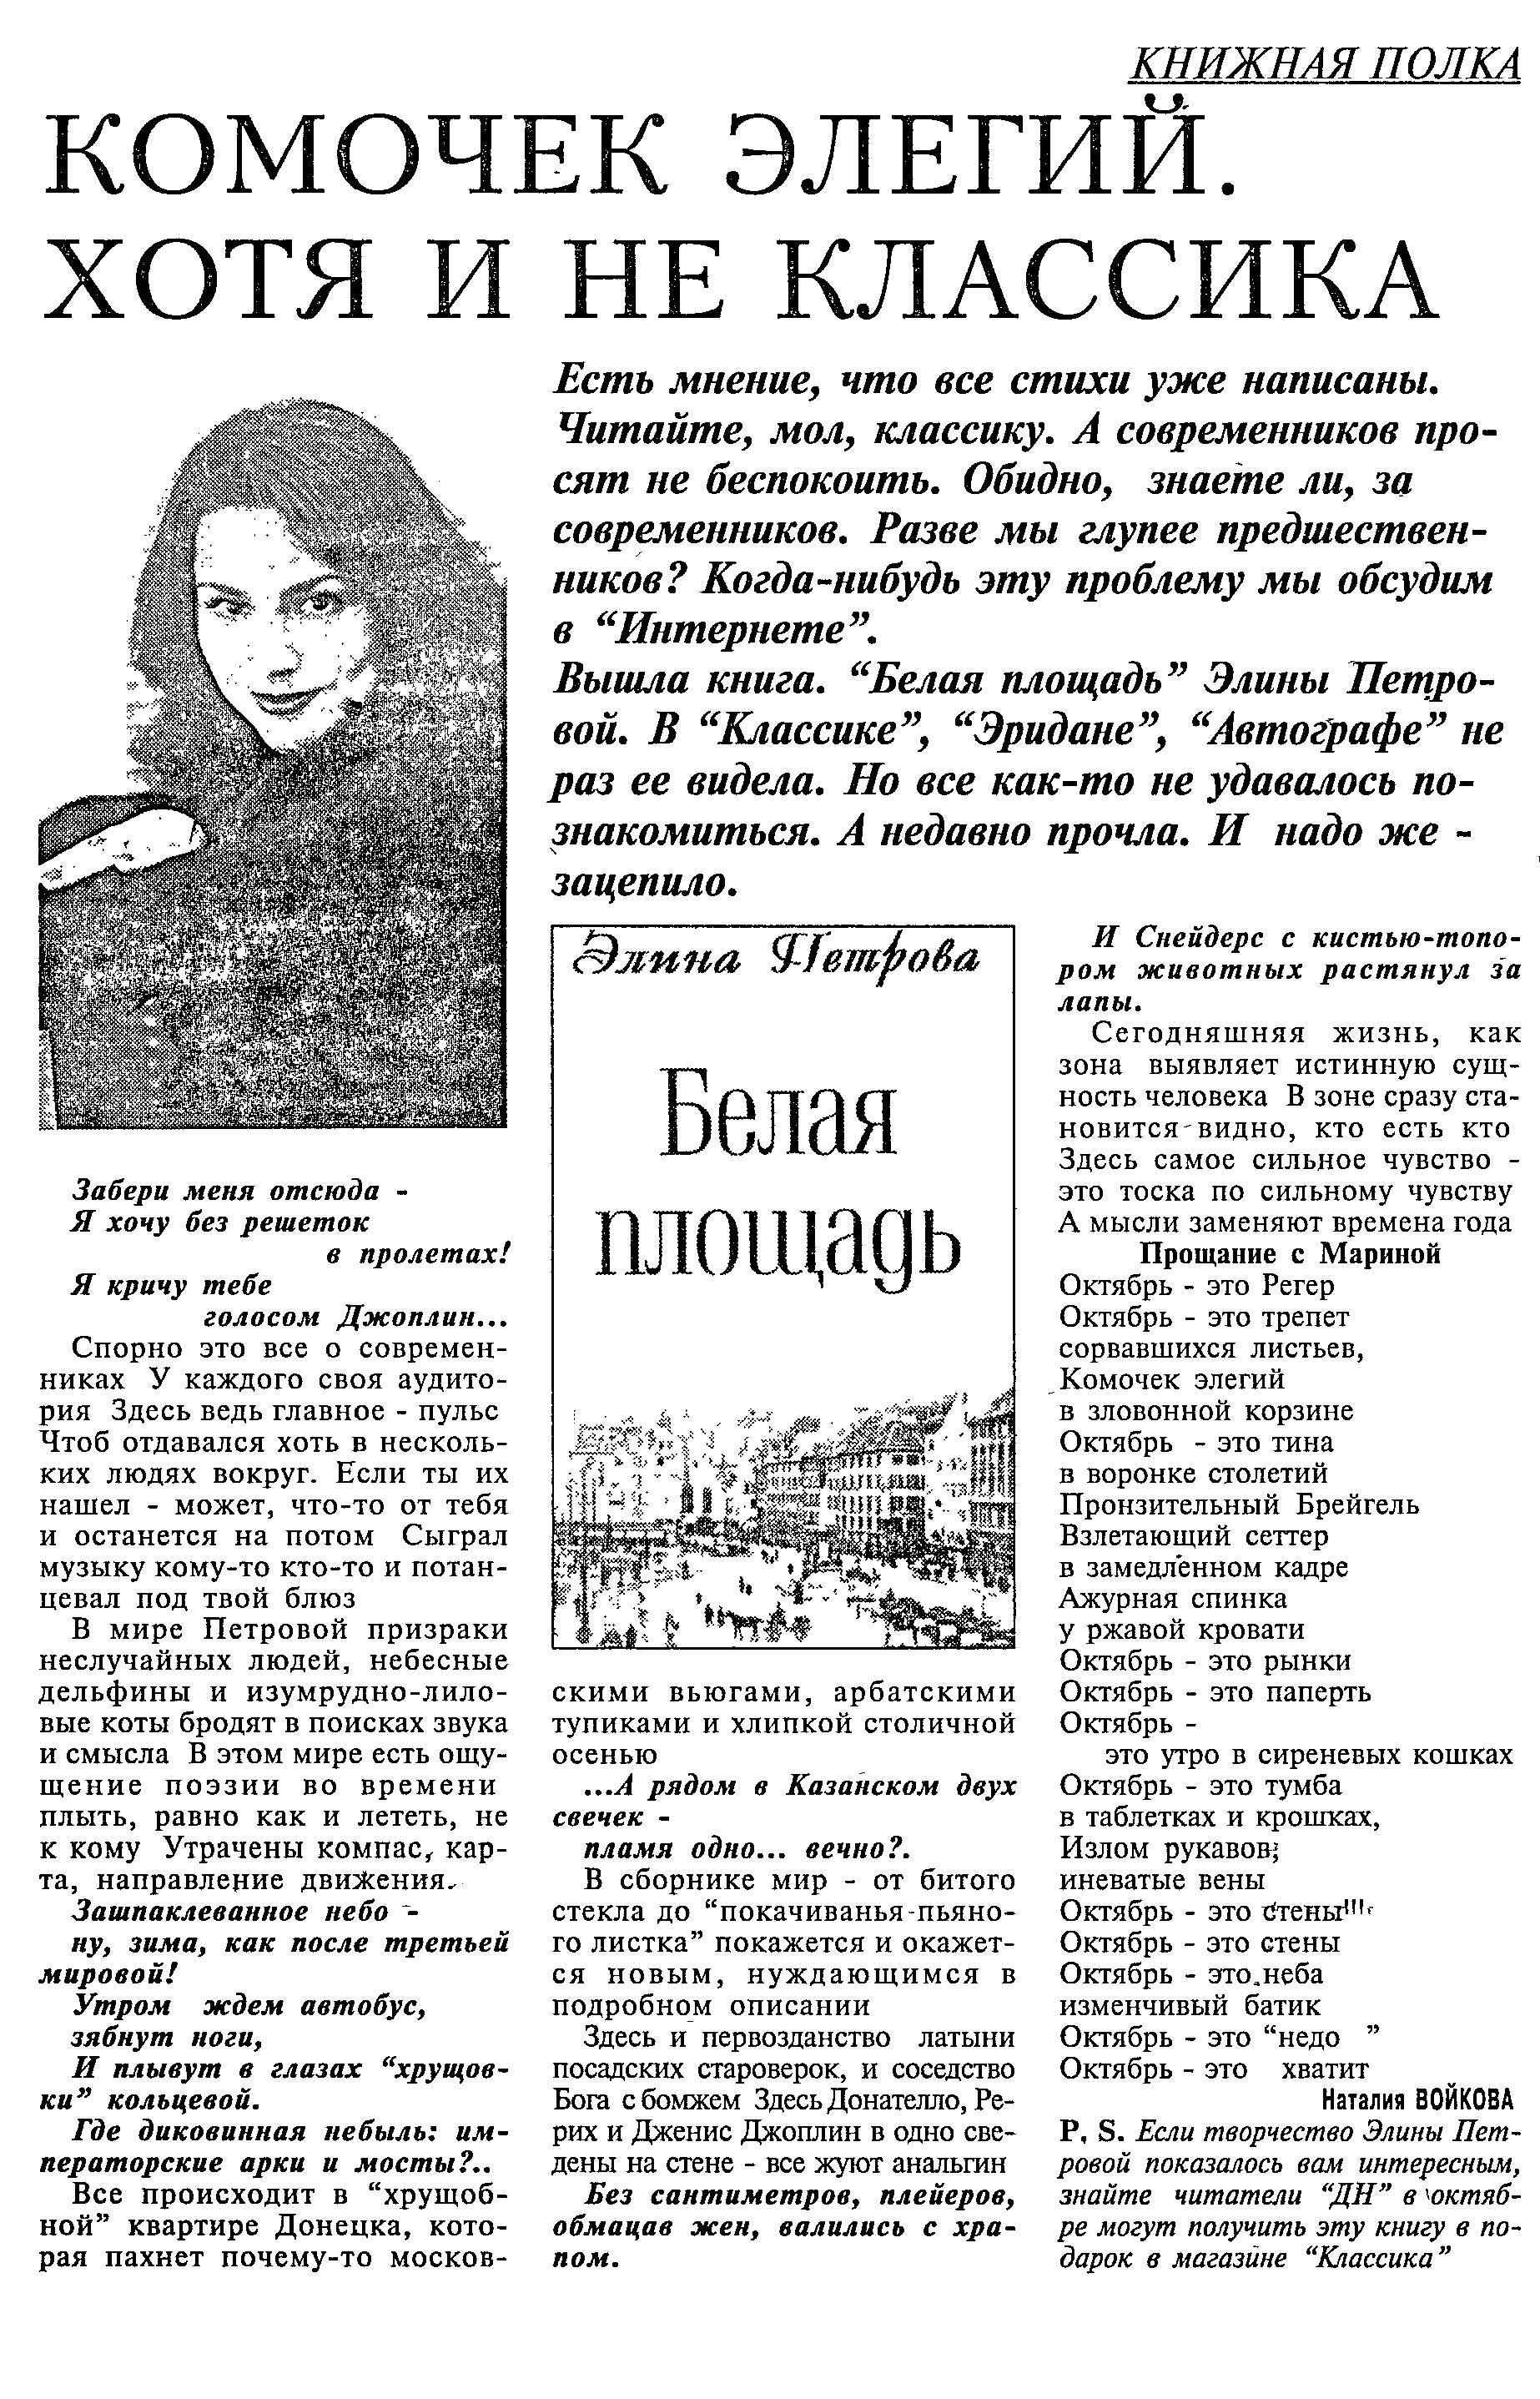 2. Donetsk News, Voikova. October 27, 1999.jpg